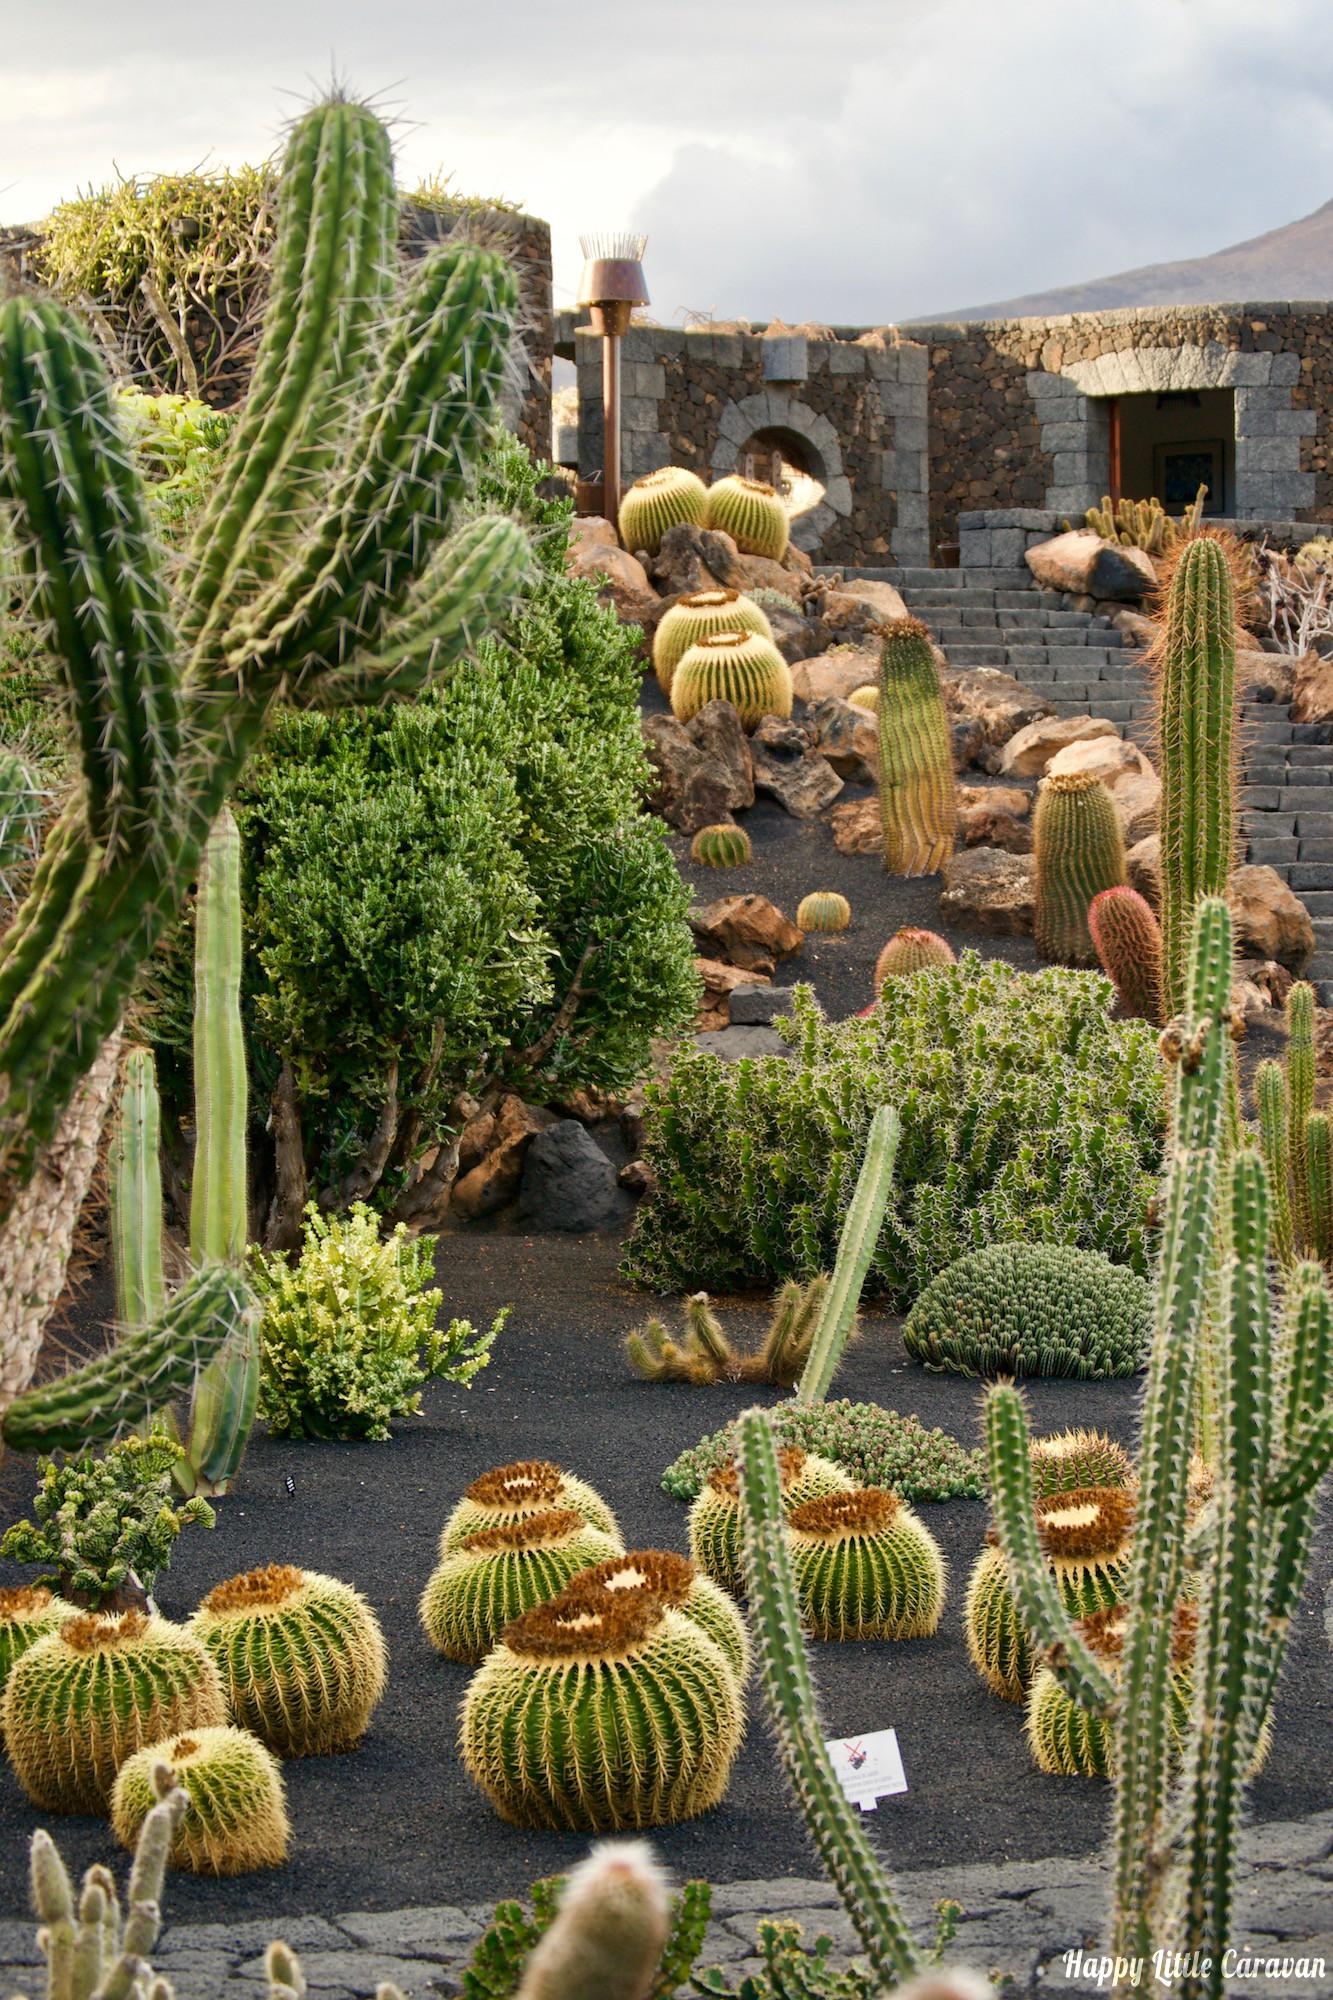 Lanzarote giardino dei cactus jardin de cactus for Jardin de cactus lanzarote